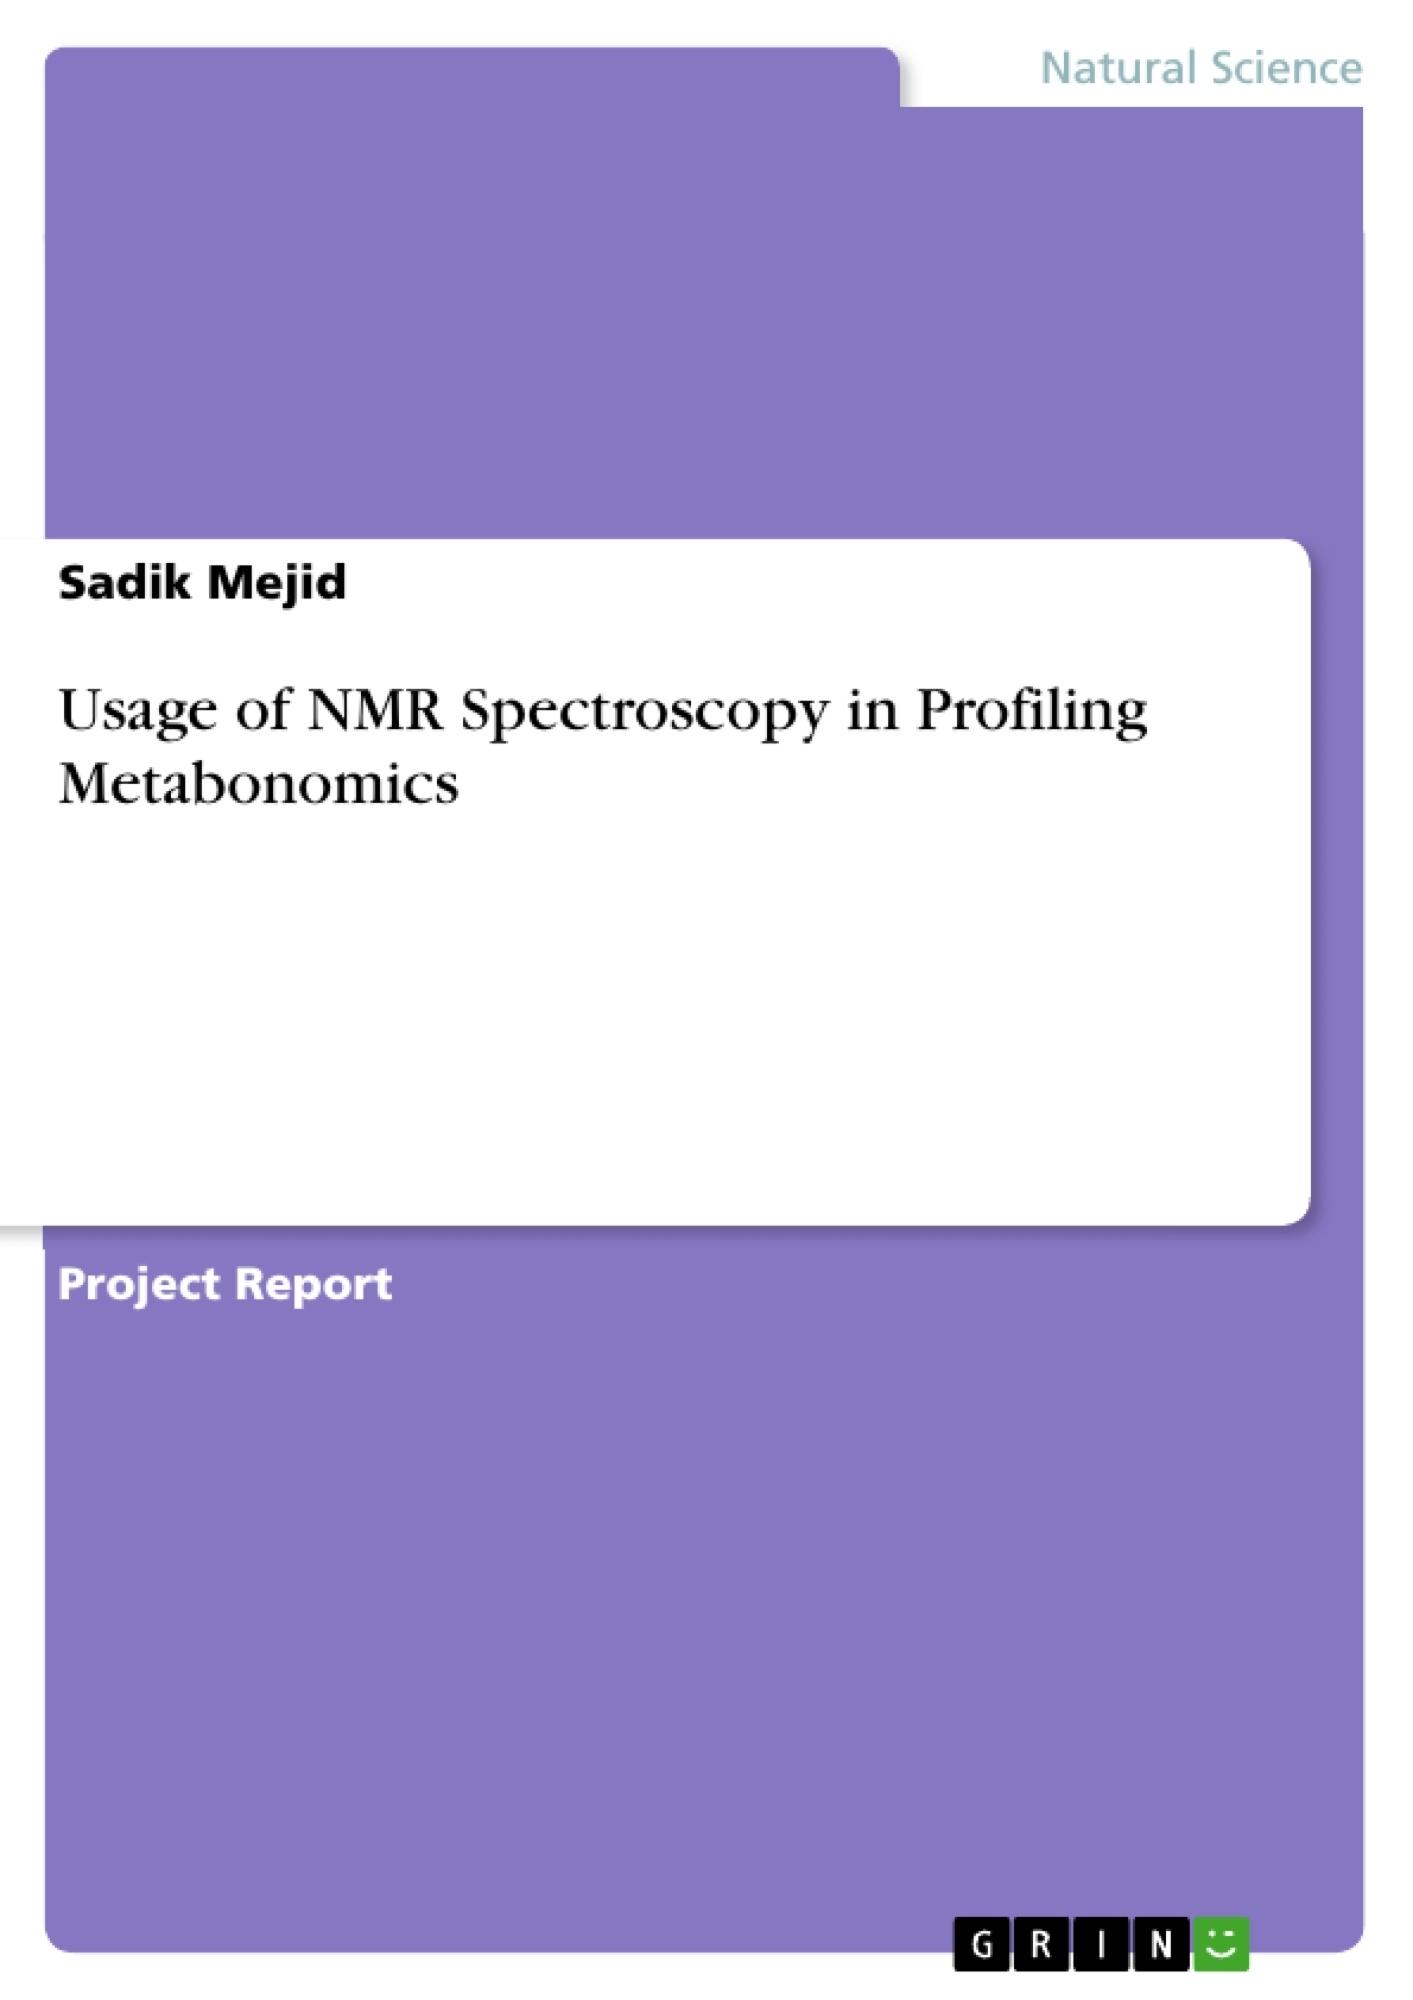 Title: Usage of NMR Spectroscopy in Profiling Metabonomics